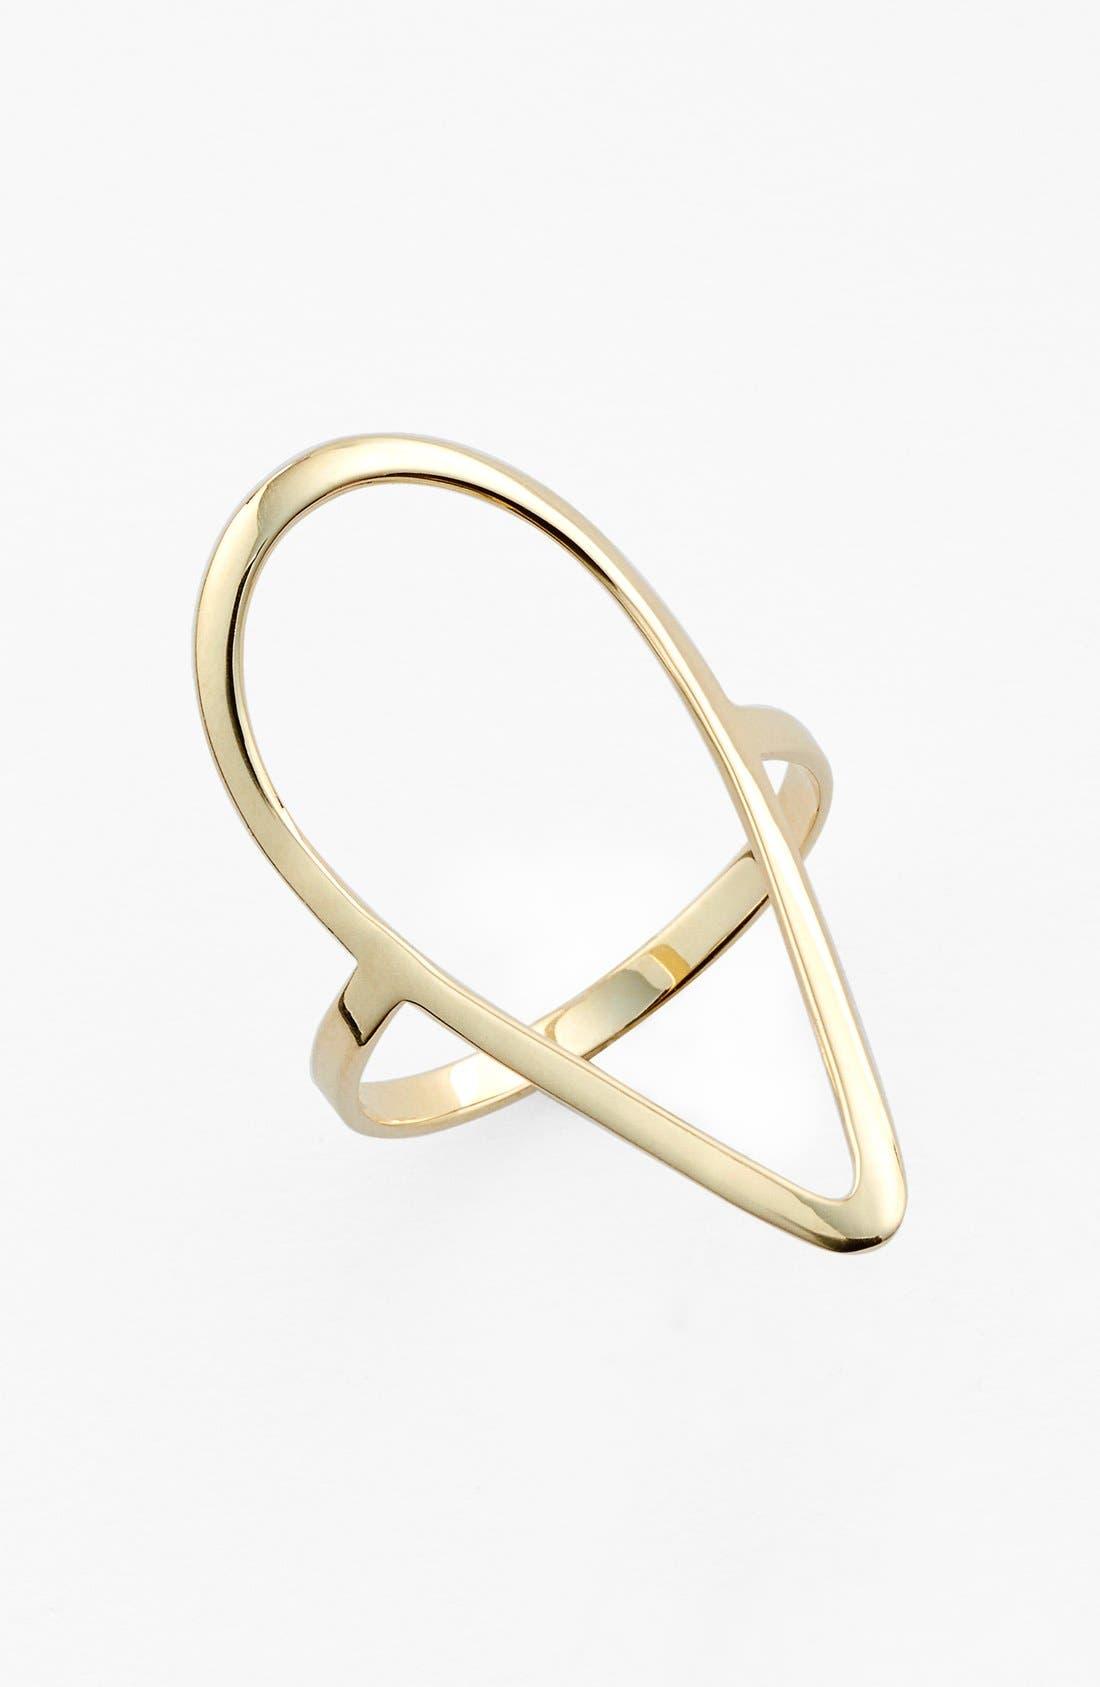 Main Image - Lana Jewelry 'Pear' Open Ring